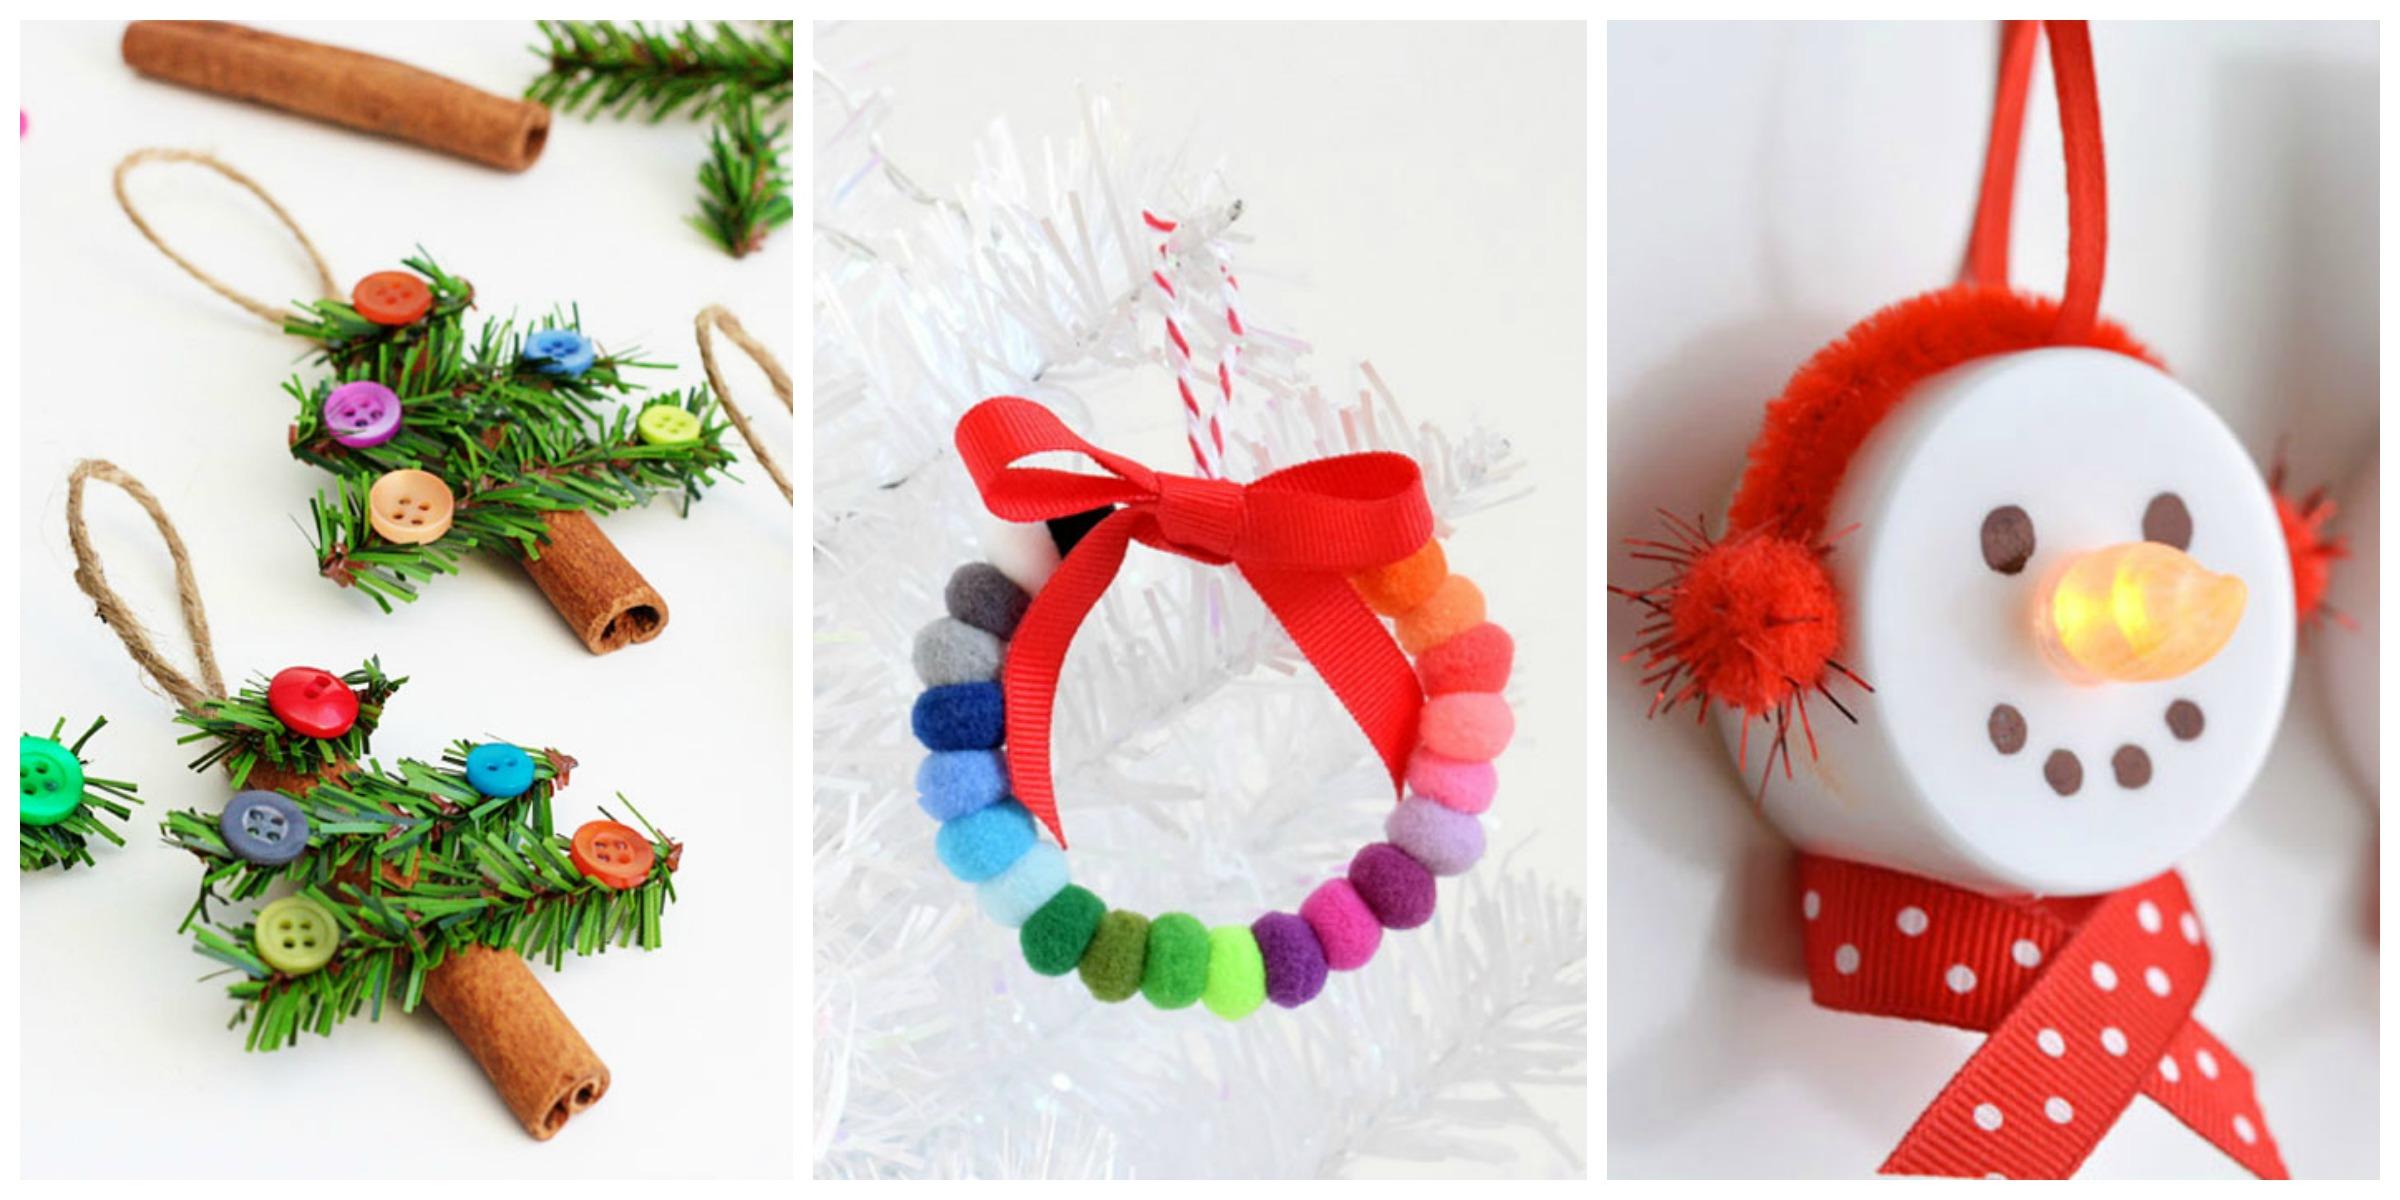 christmas photo ornament ideas - 56 Unique DIY Christmas Ornaments Easy Homemade Ornament